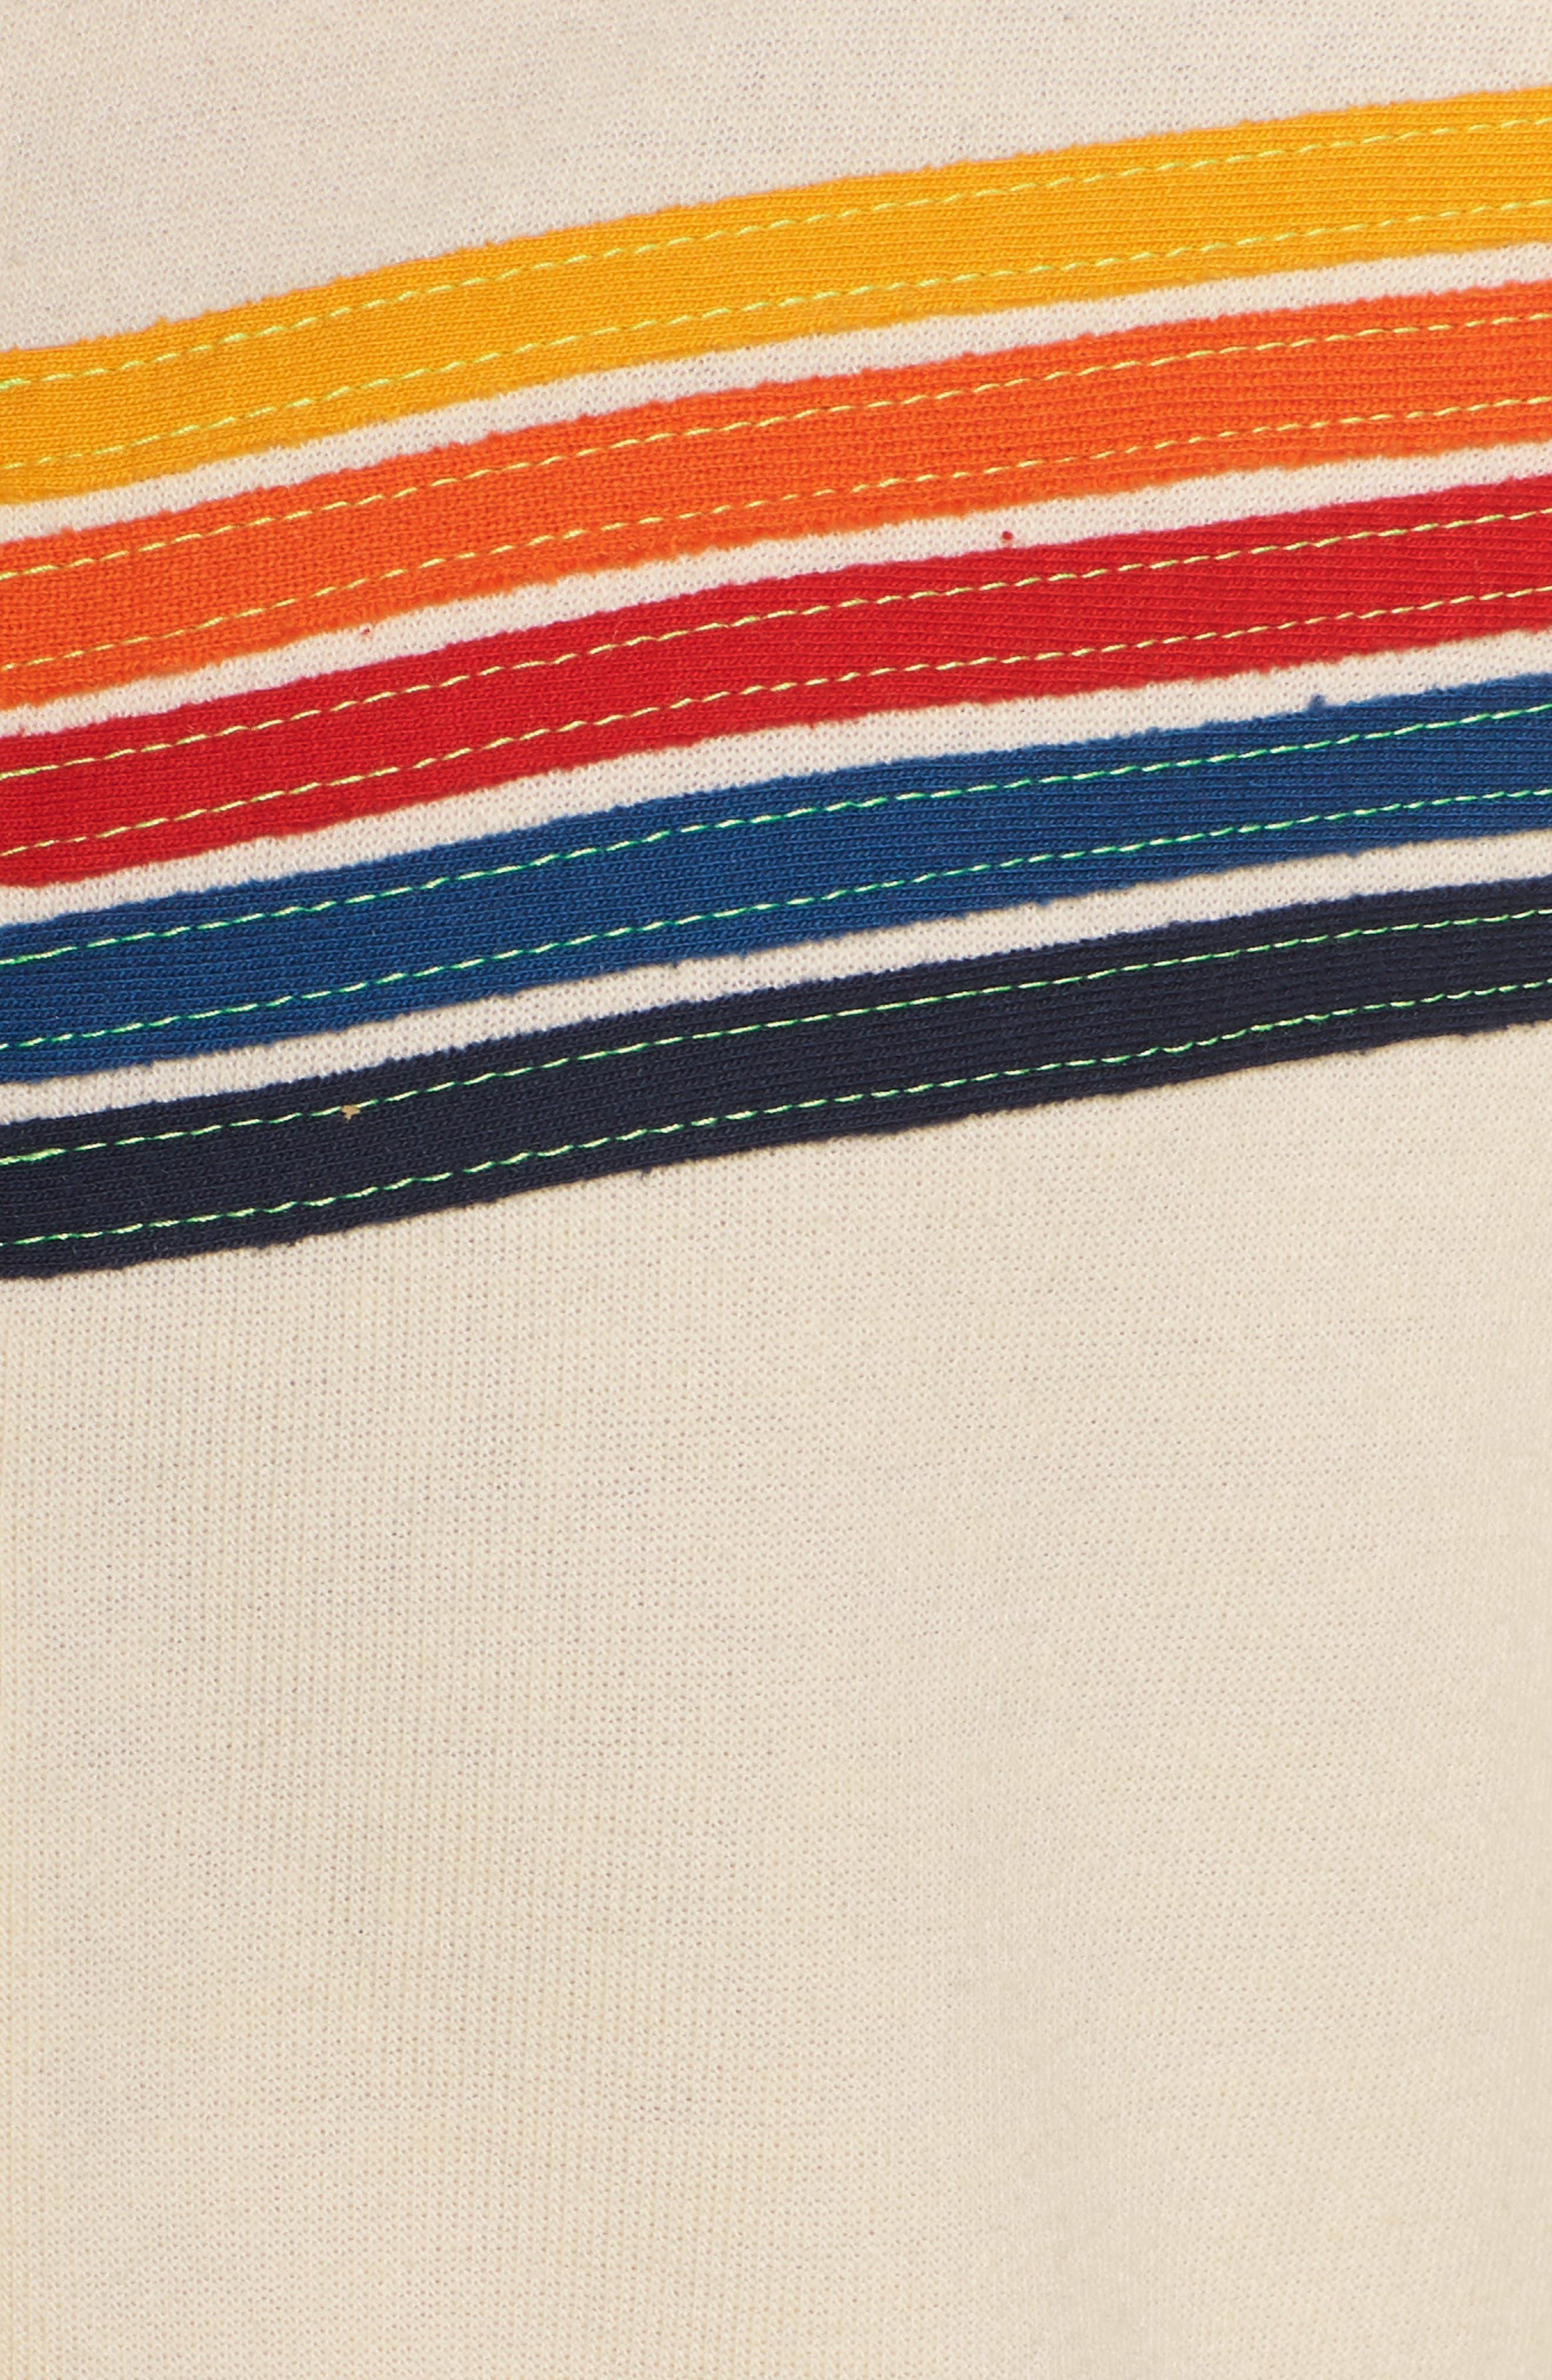 AVIATOR NATION,                             5-Stripe Zip Hoodie,                             Alternate thumbnail 6, color,                             VINTAGE WHITE